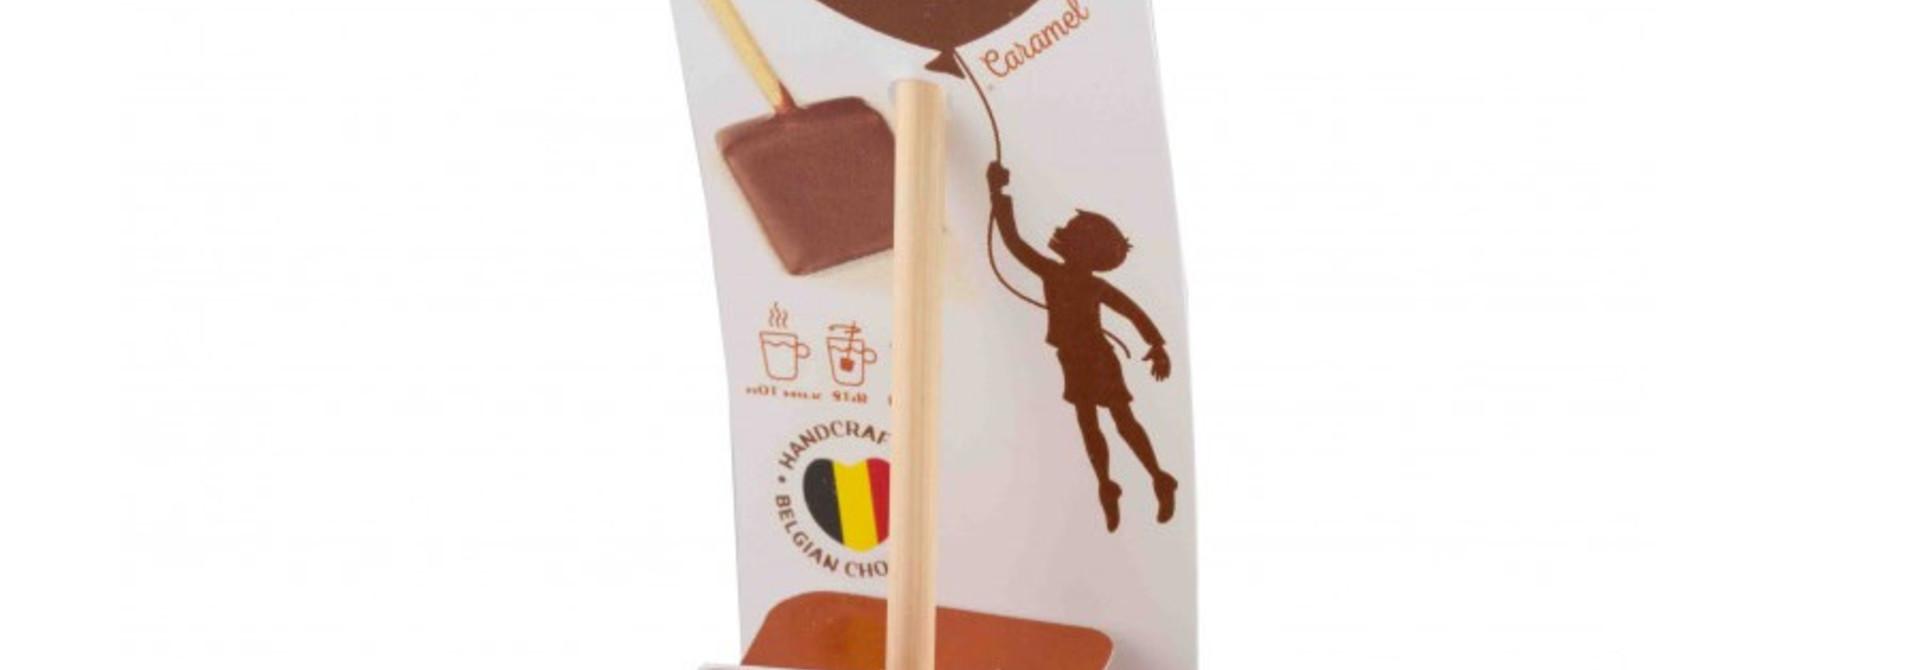 Choco stick caramel